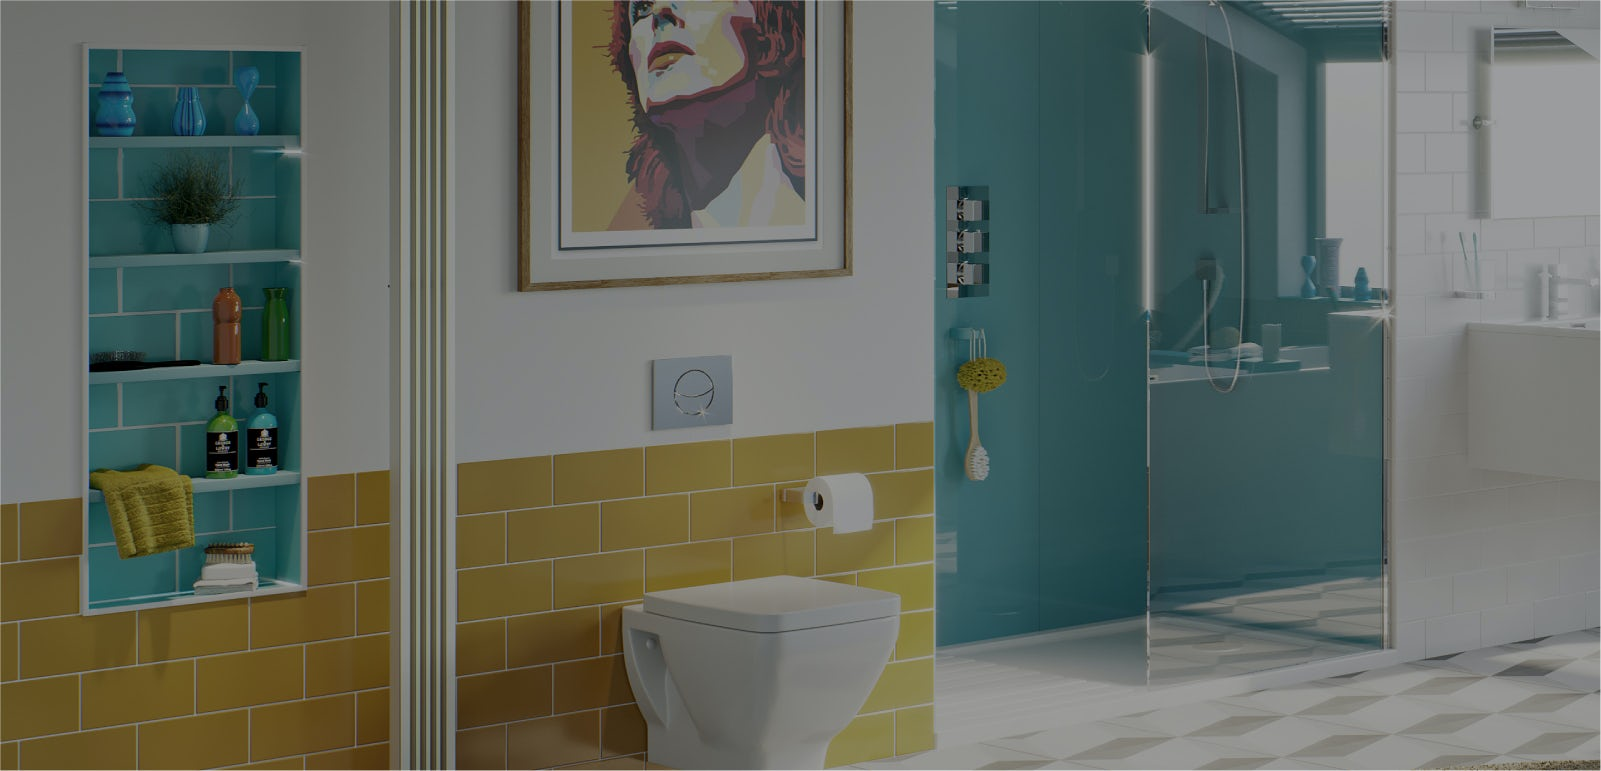 Bathroom ideas: New Retro part 2